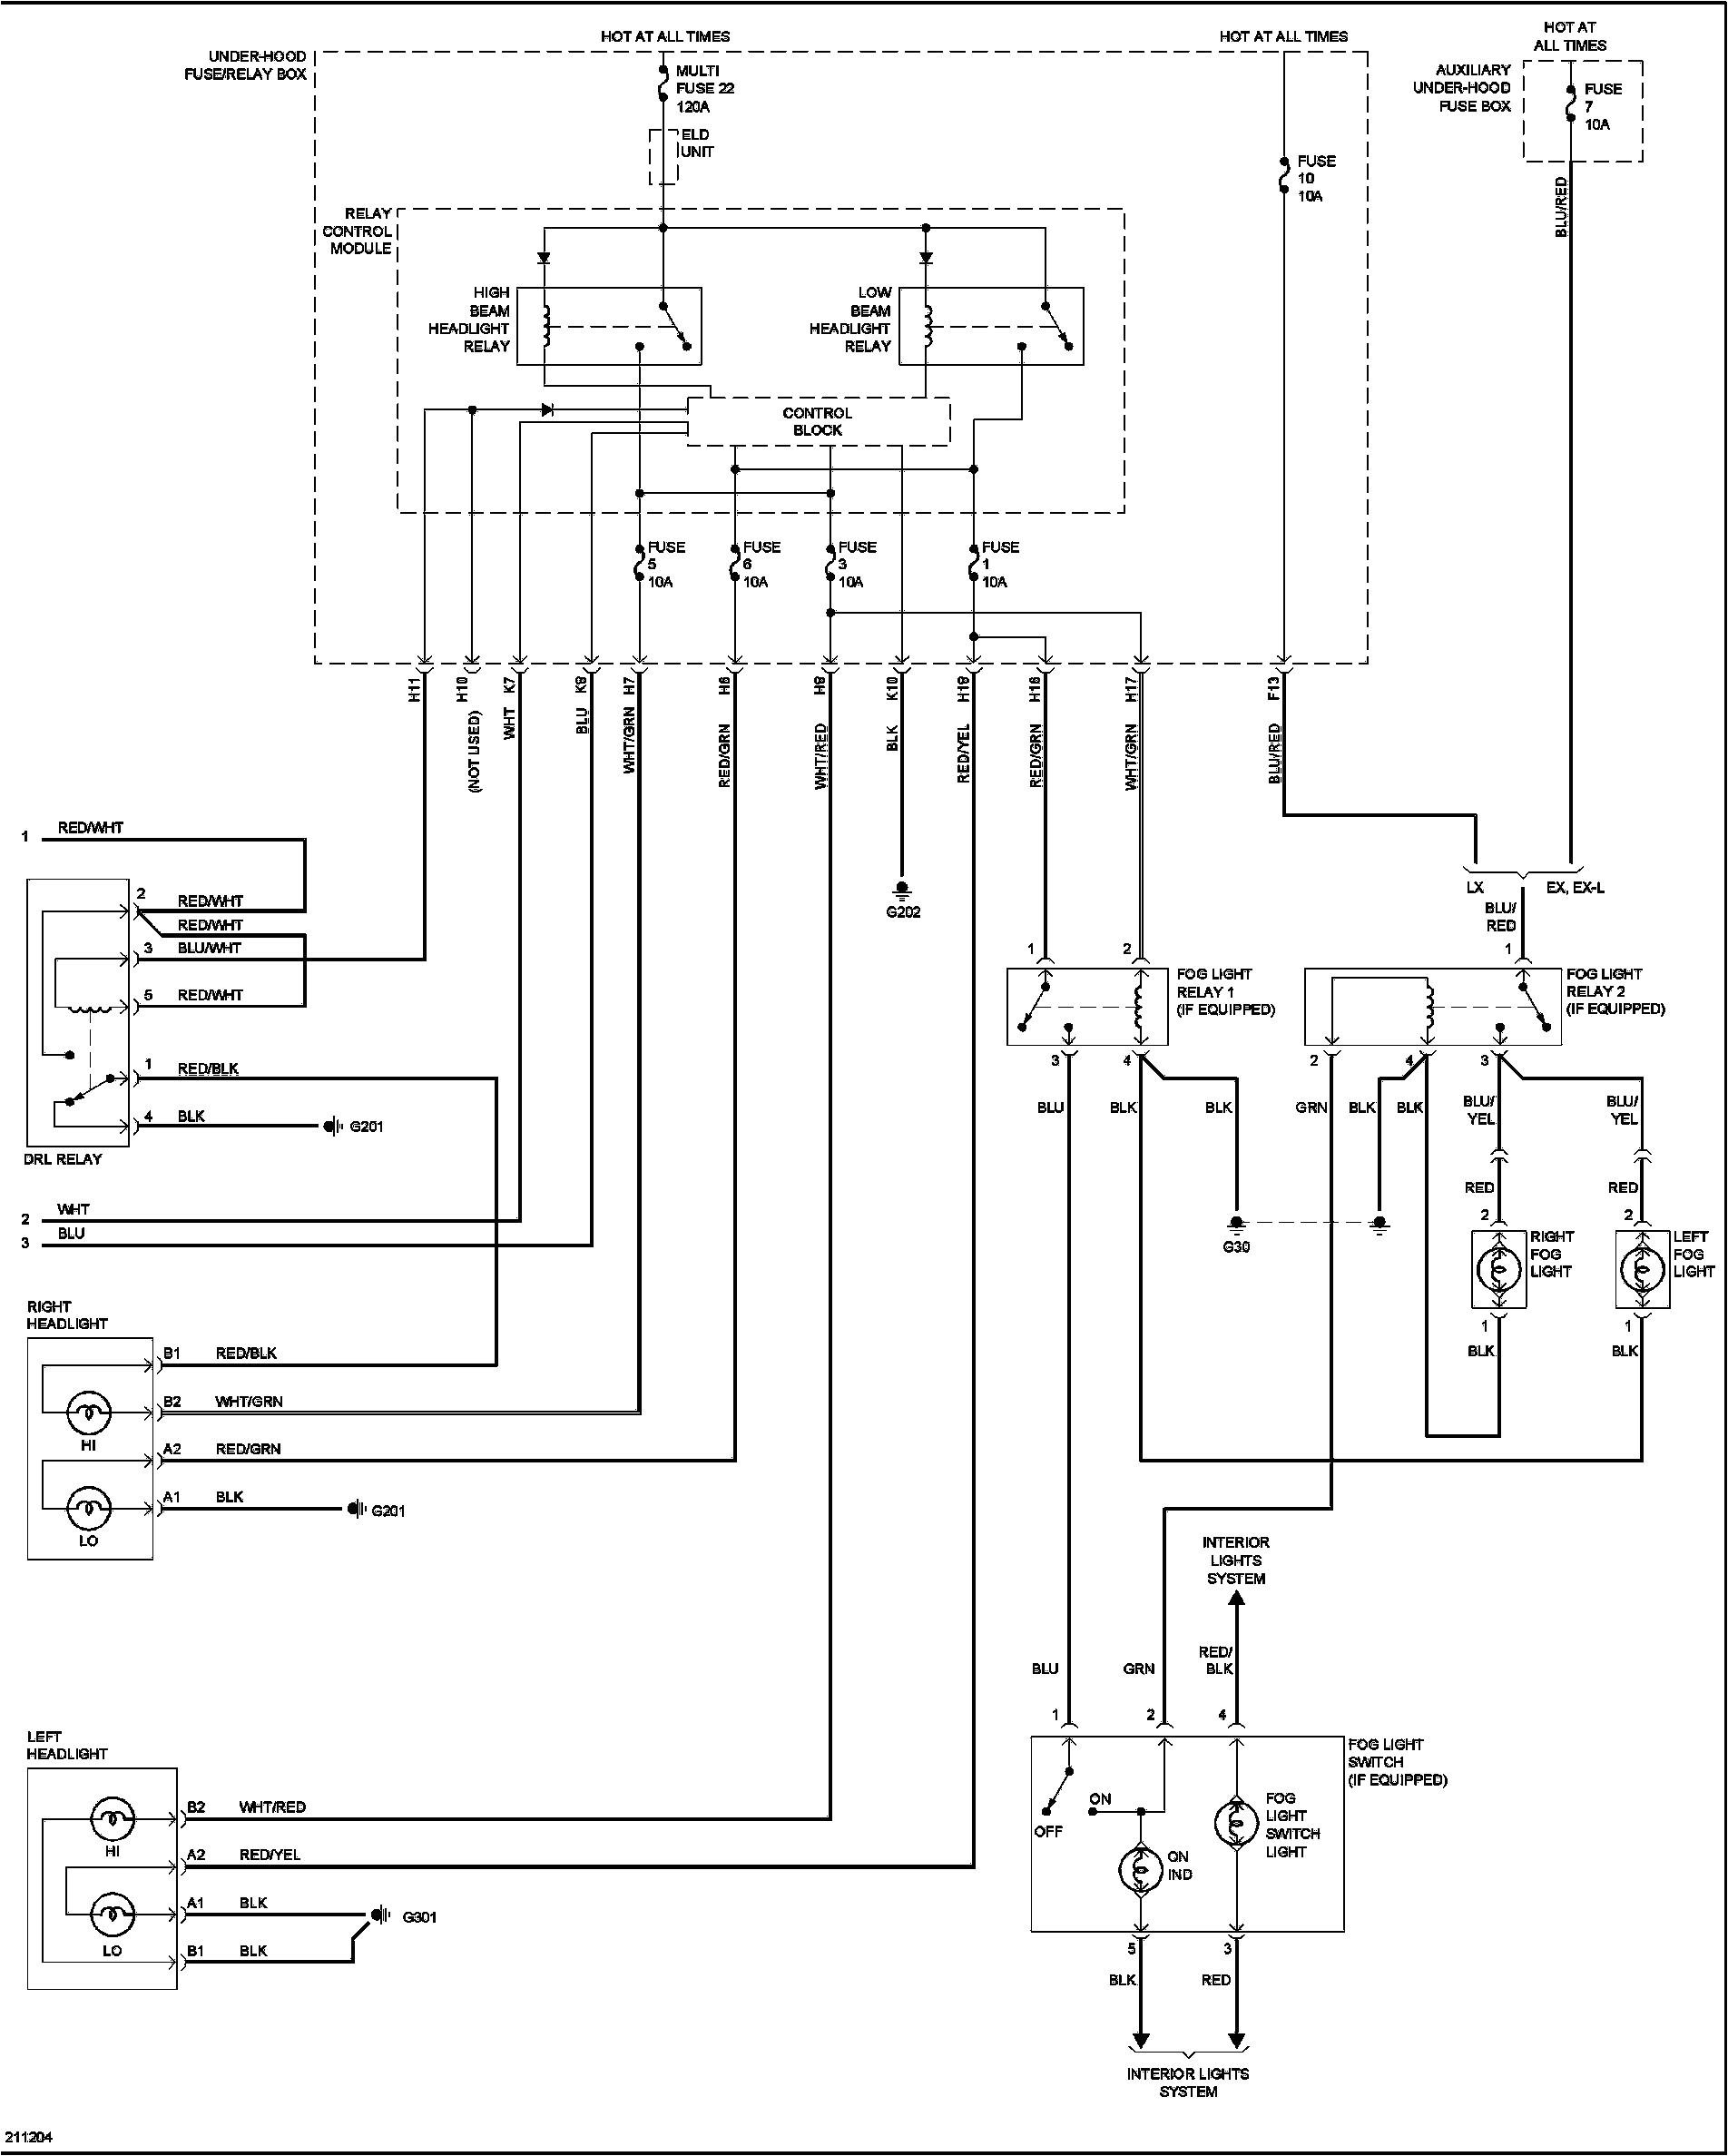 2007 honda accord ac wiring wiring diagram centre harness diagram 94 honda accord air conditioner likewise honda civic